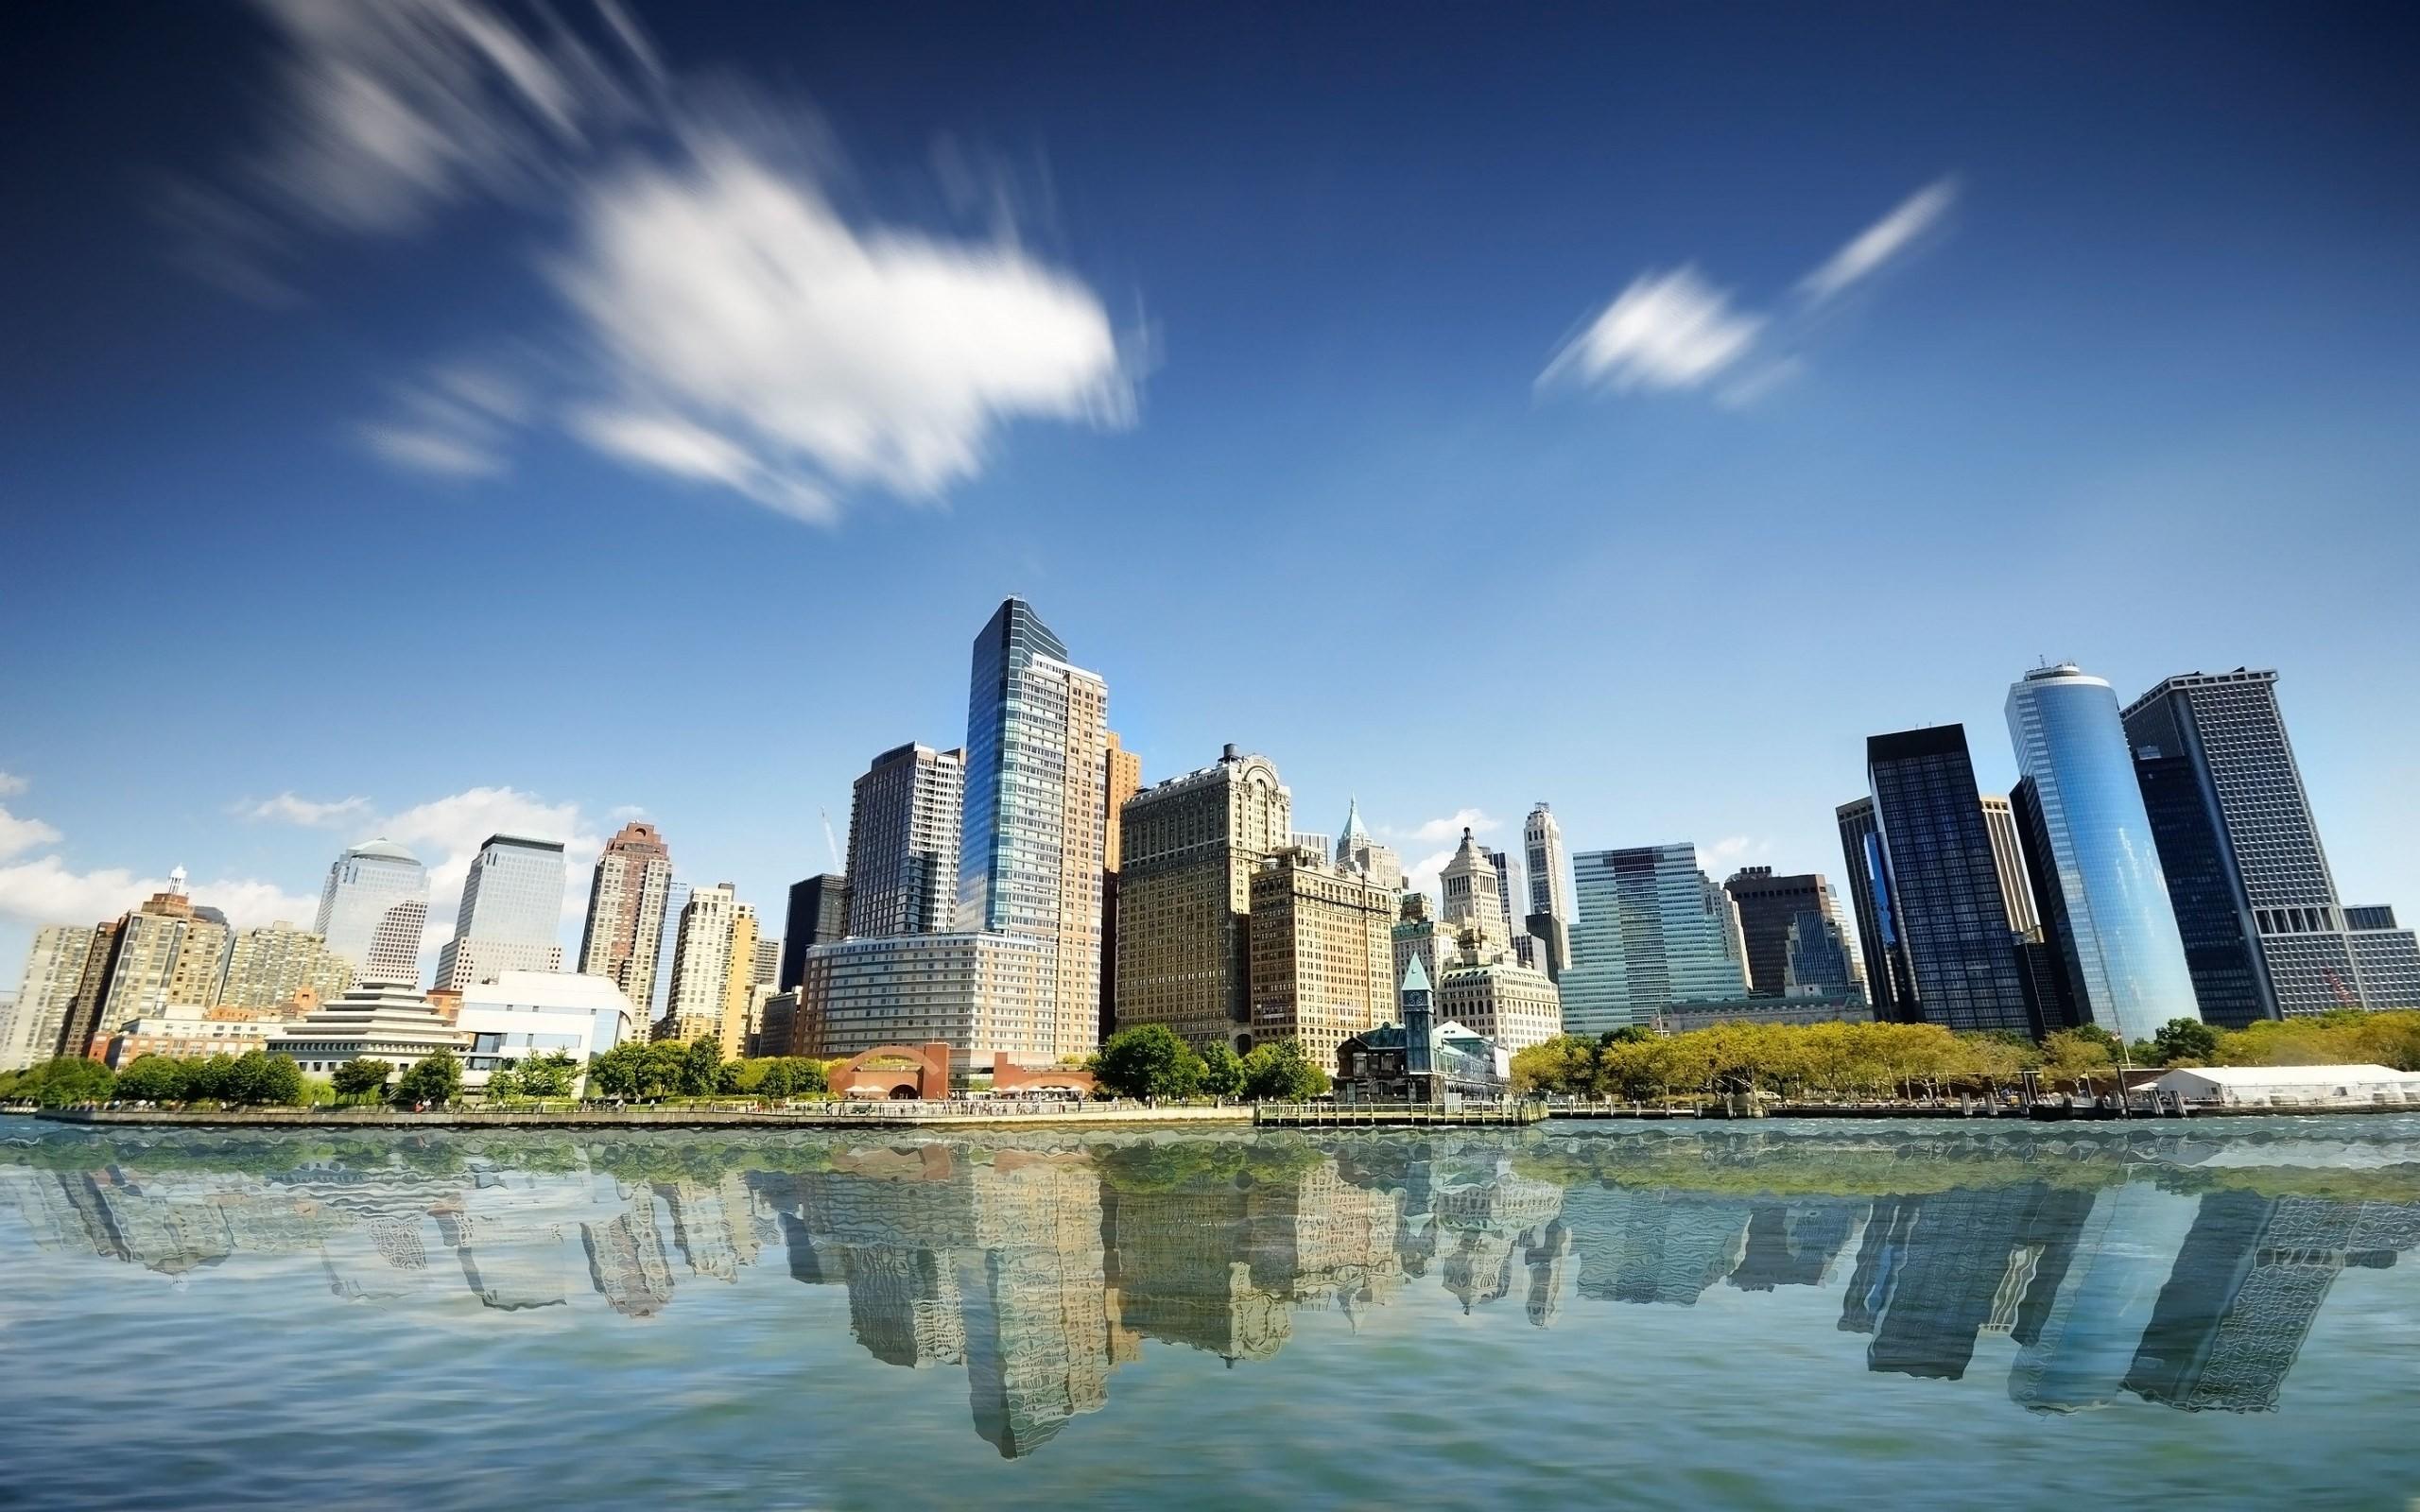 new york screensaver and wallpaper 71 images